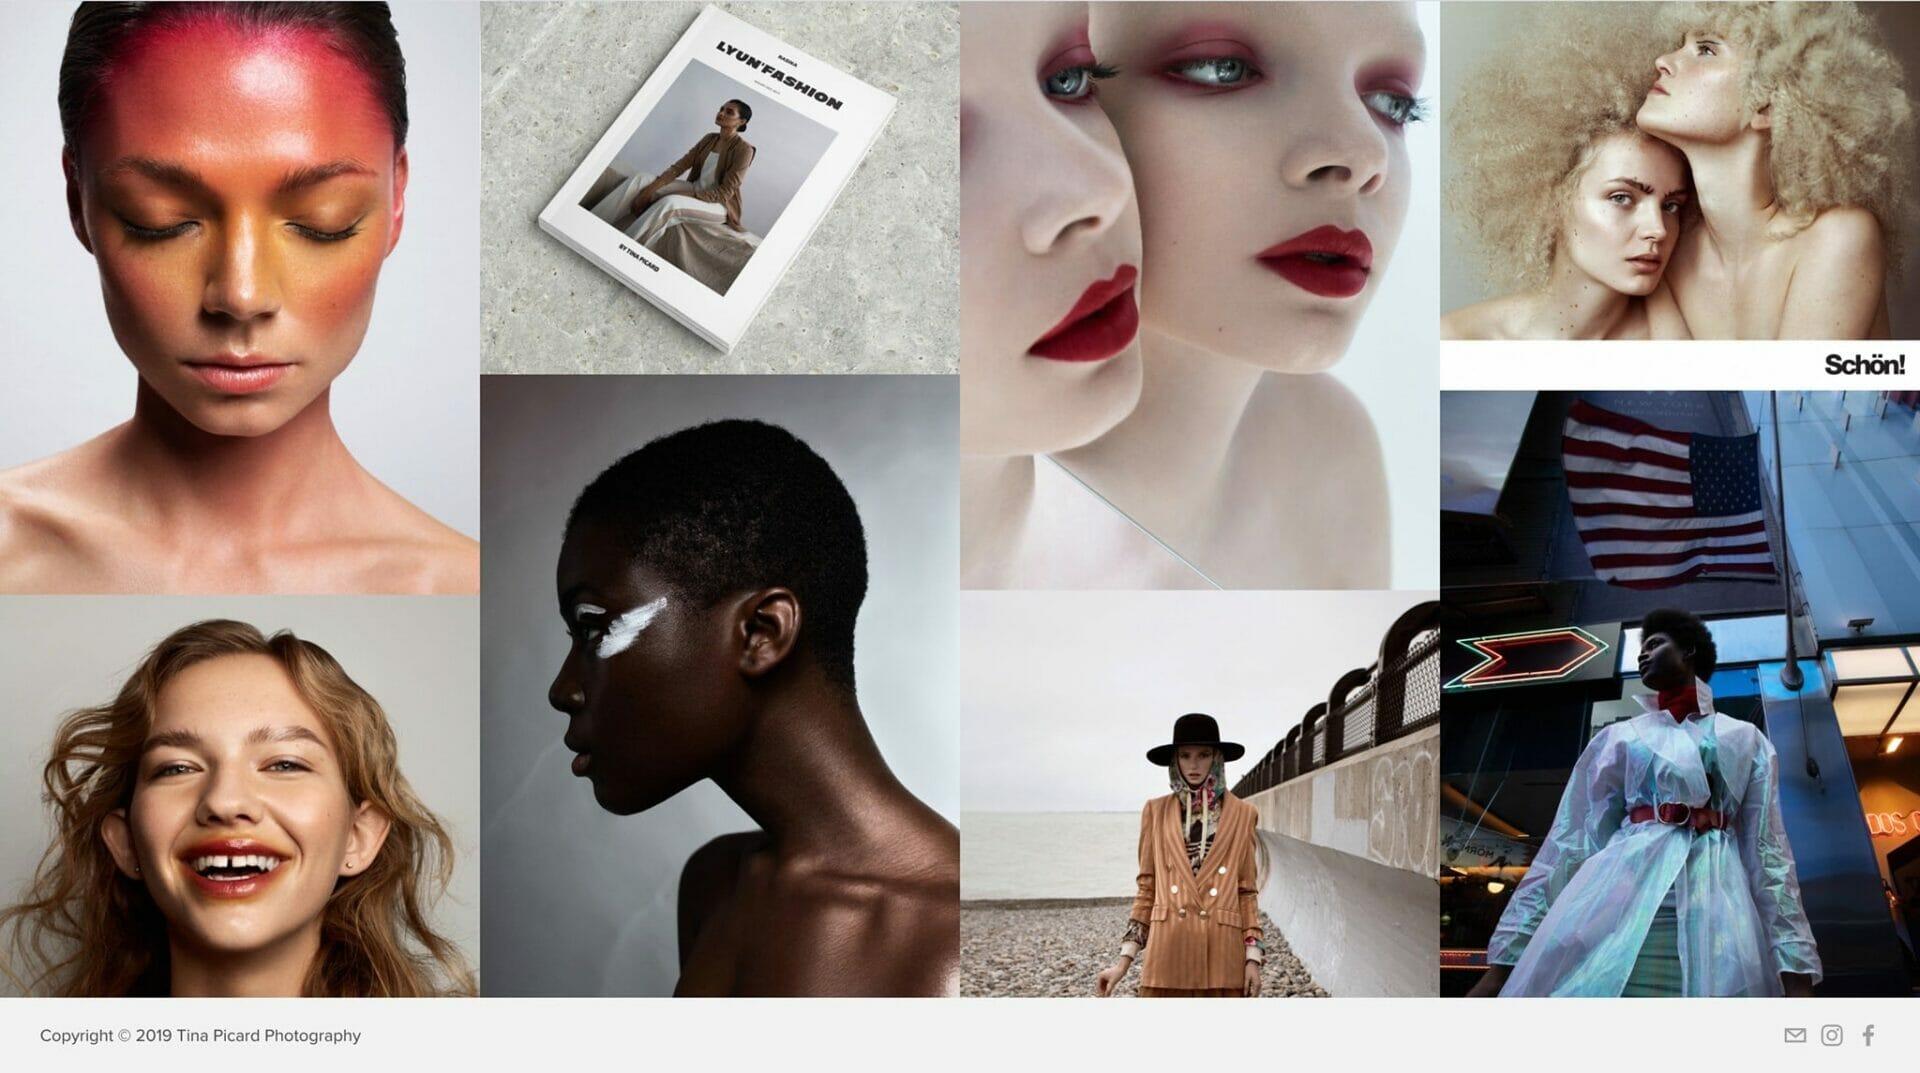 tina picard fashion photographer in toronto